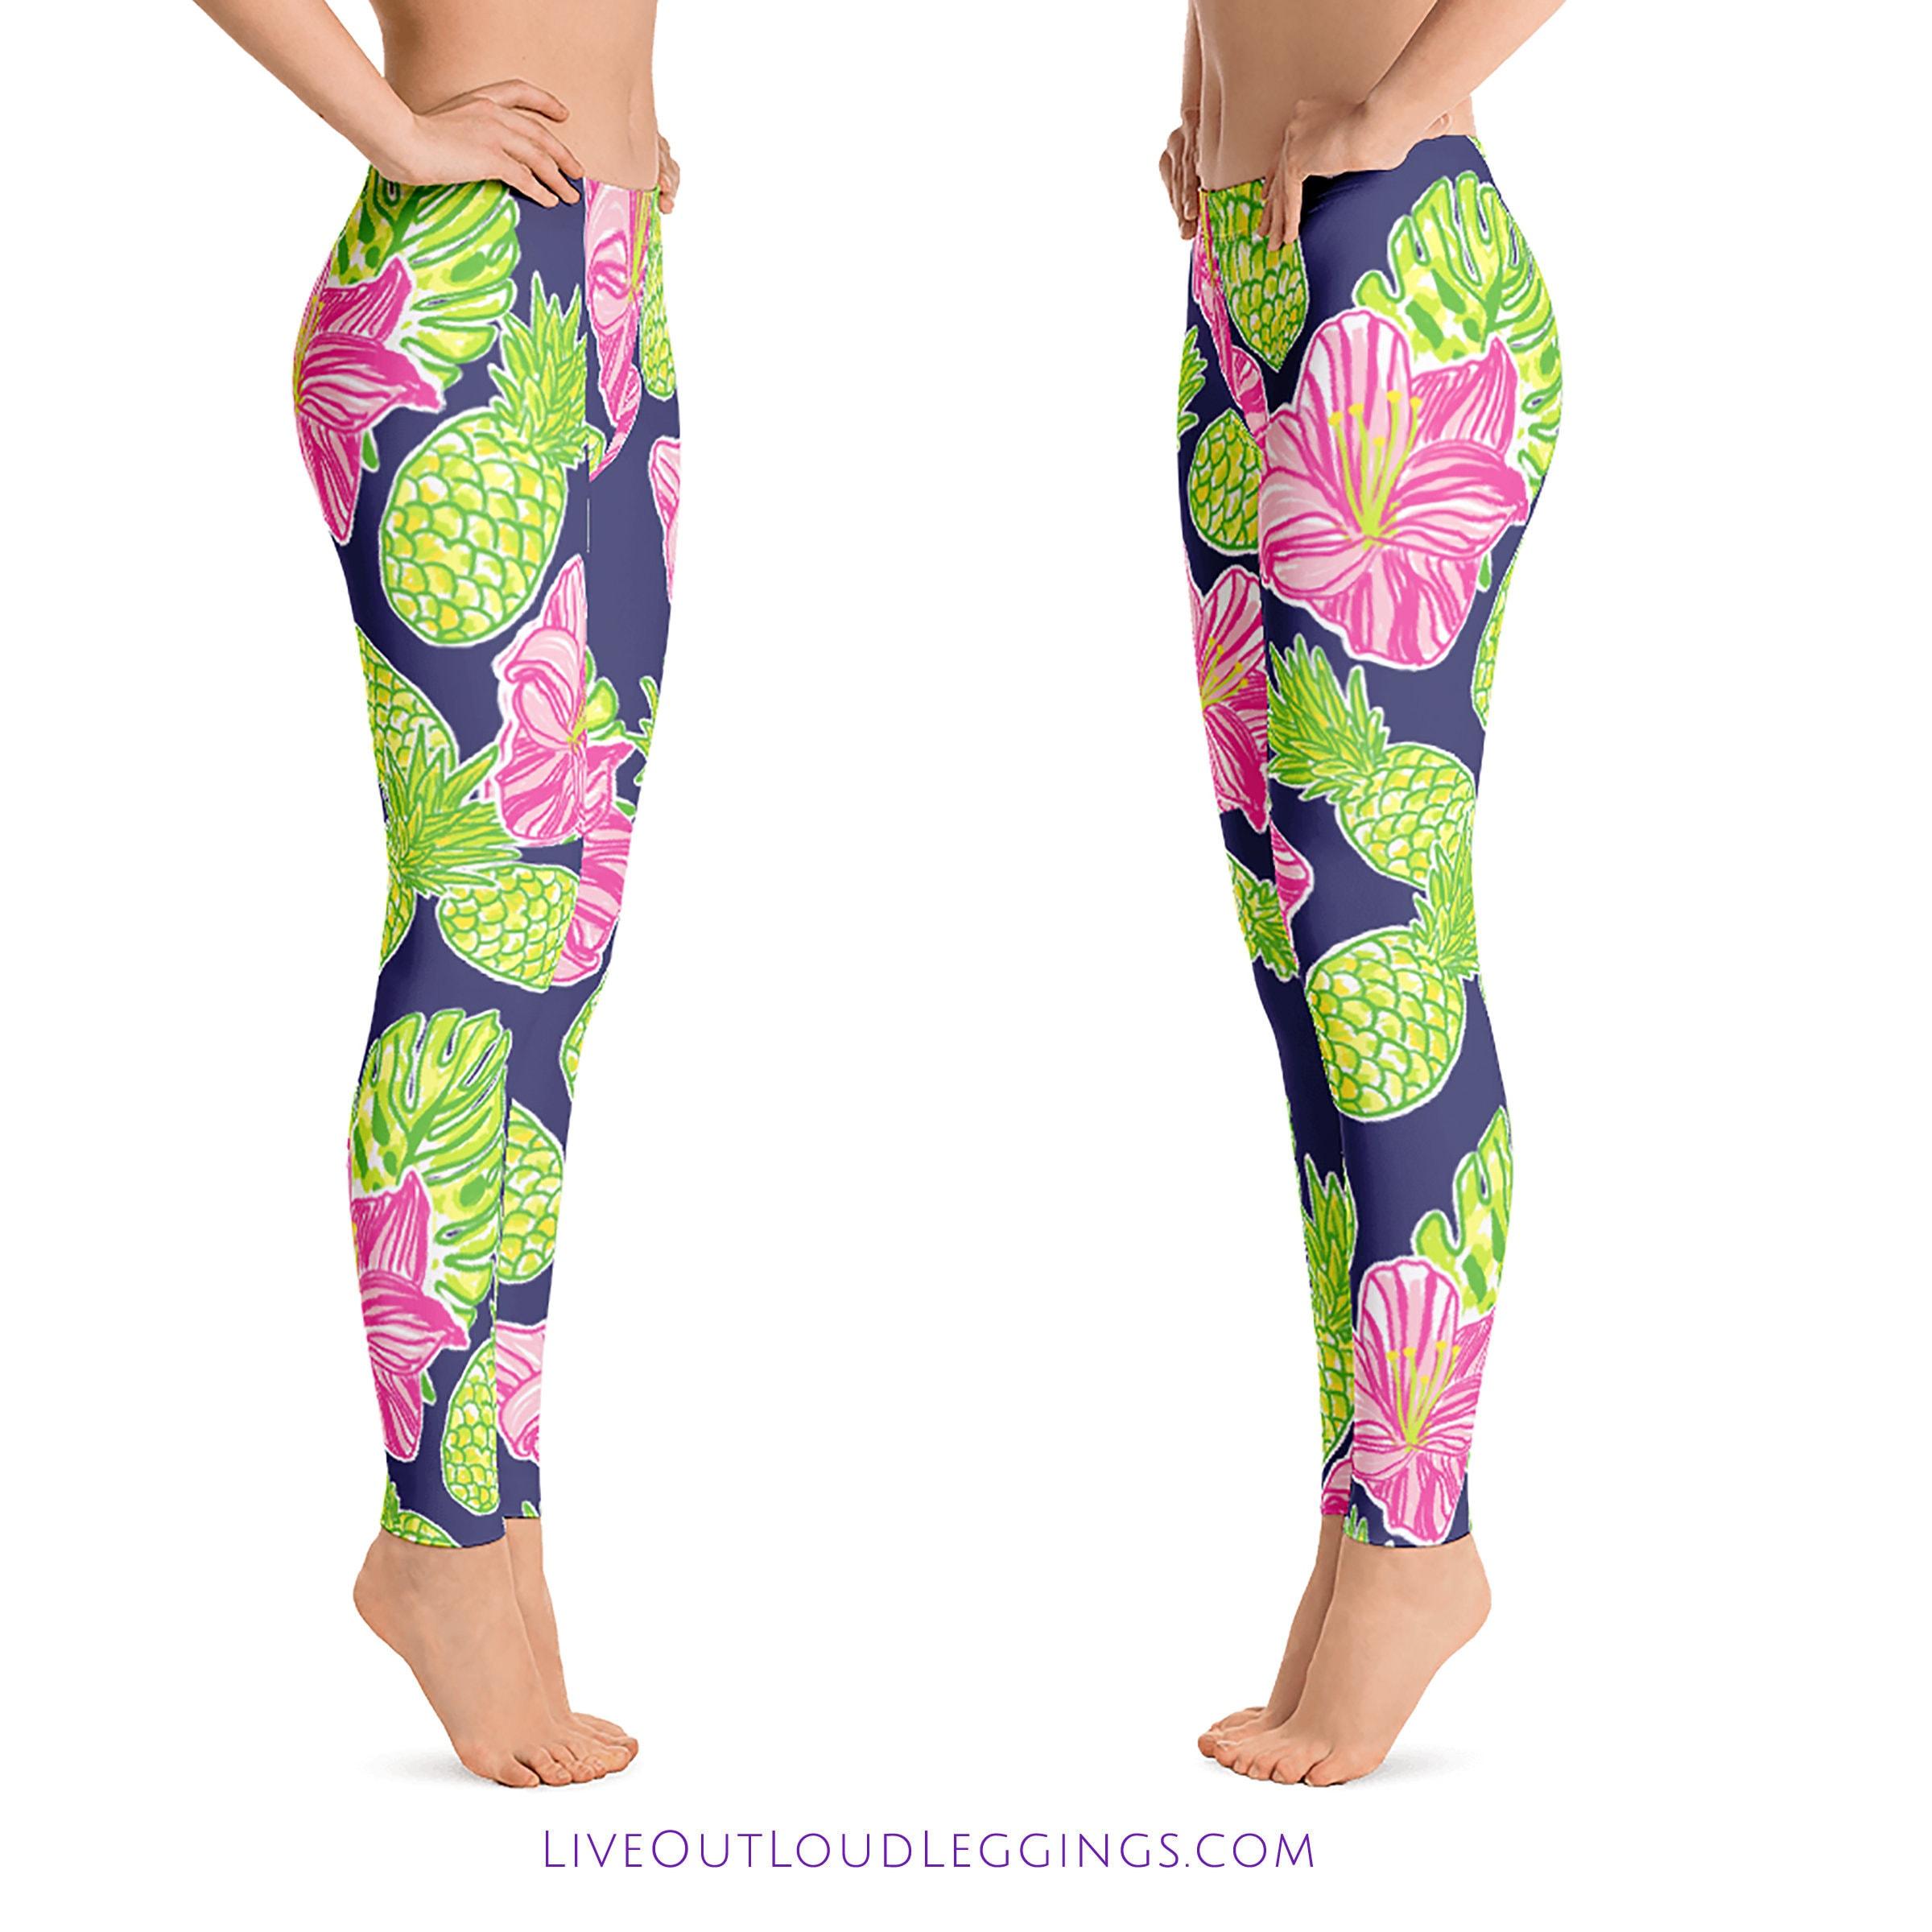 Girls Patterned Leggings Simple Design Ideas